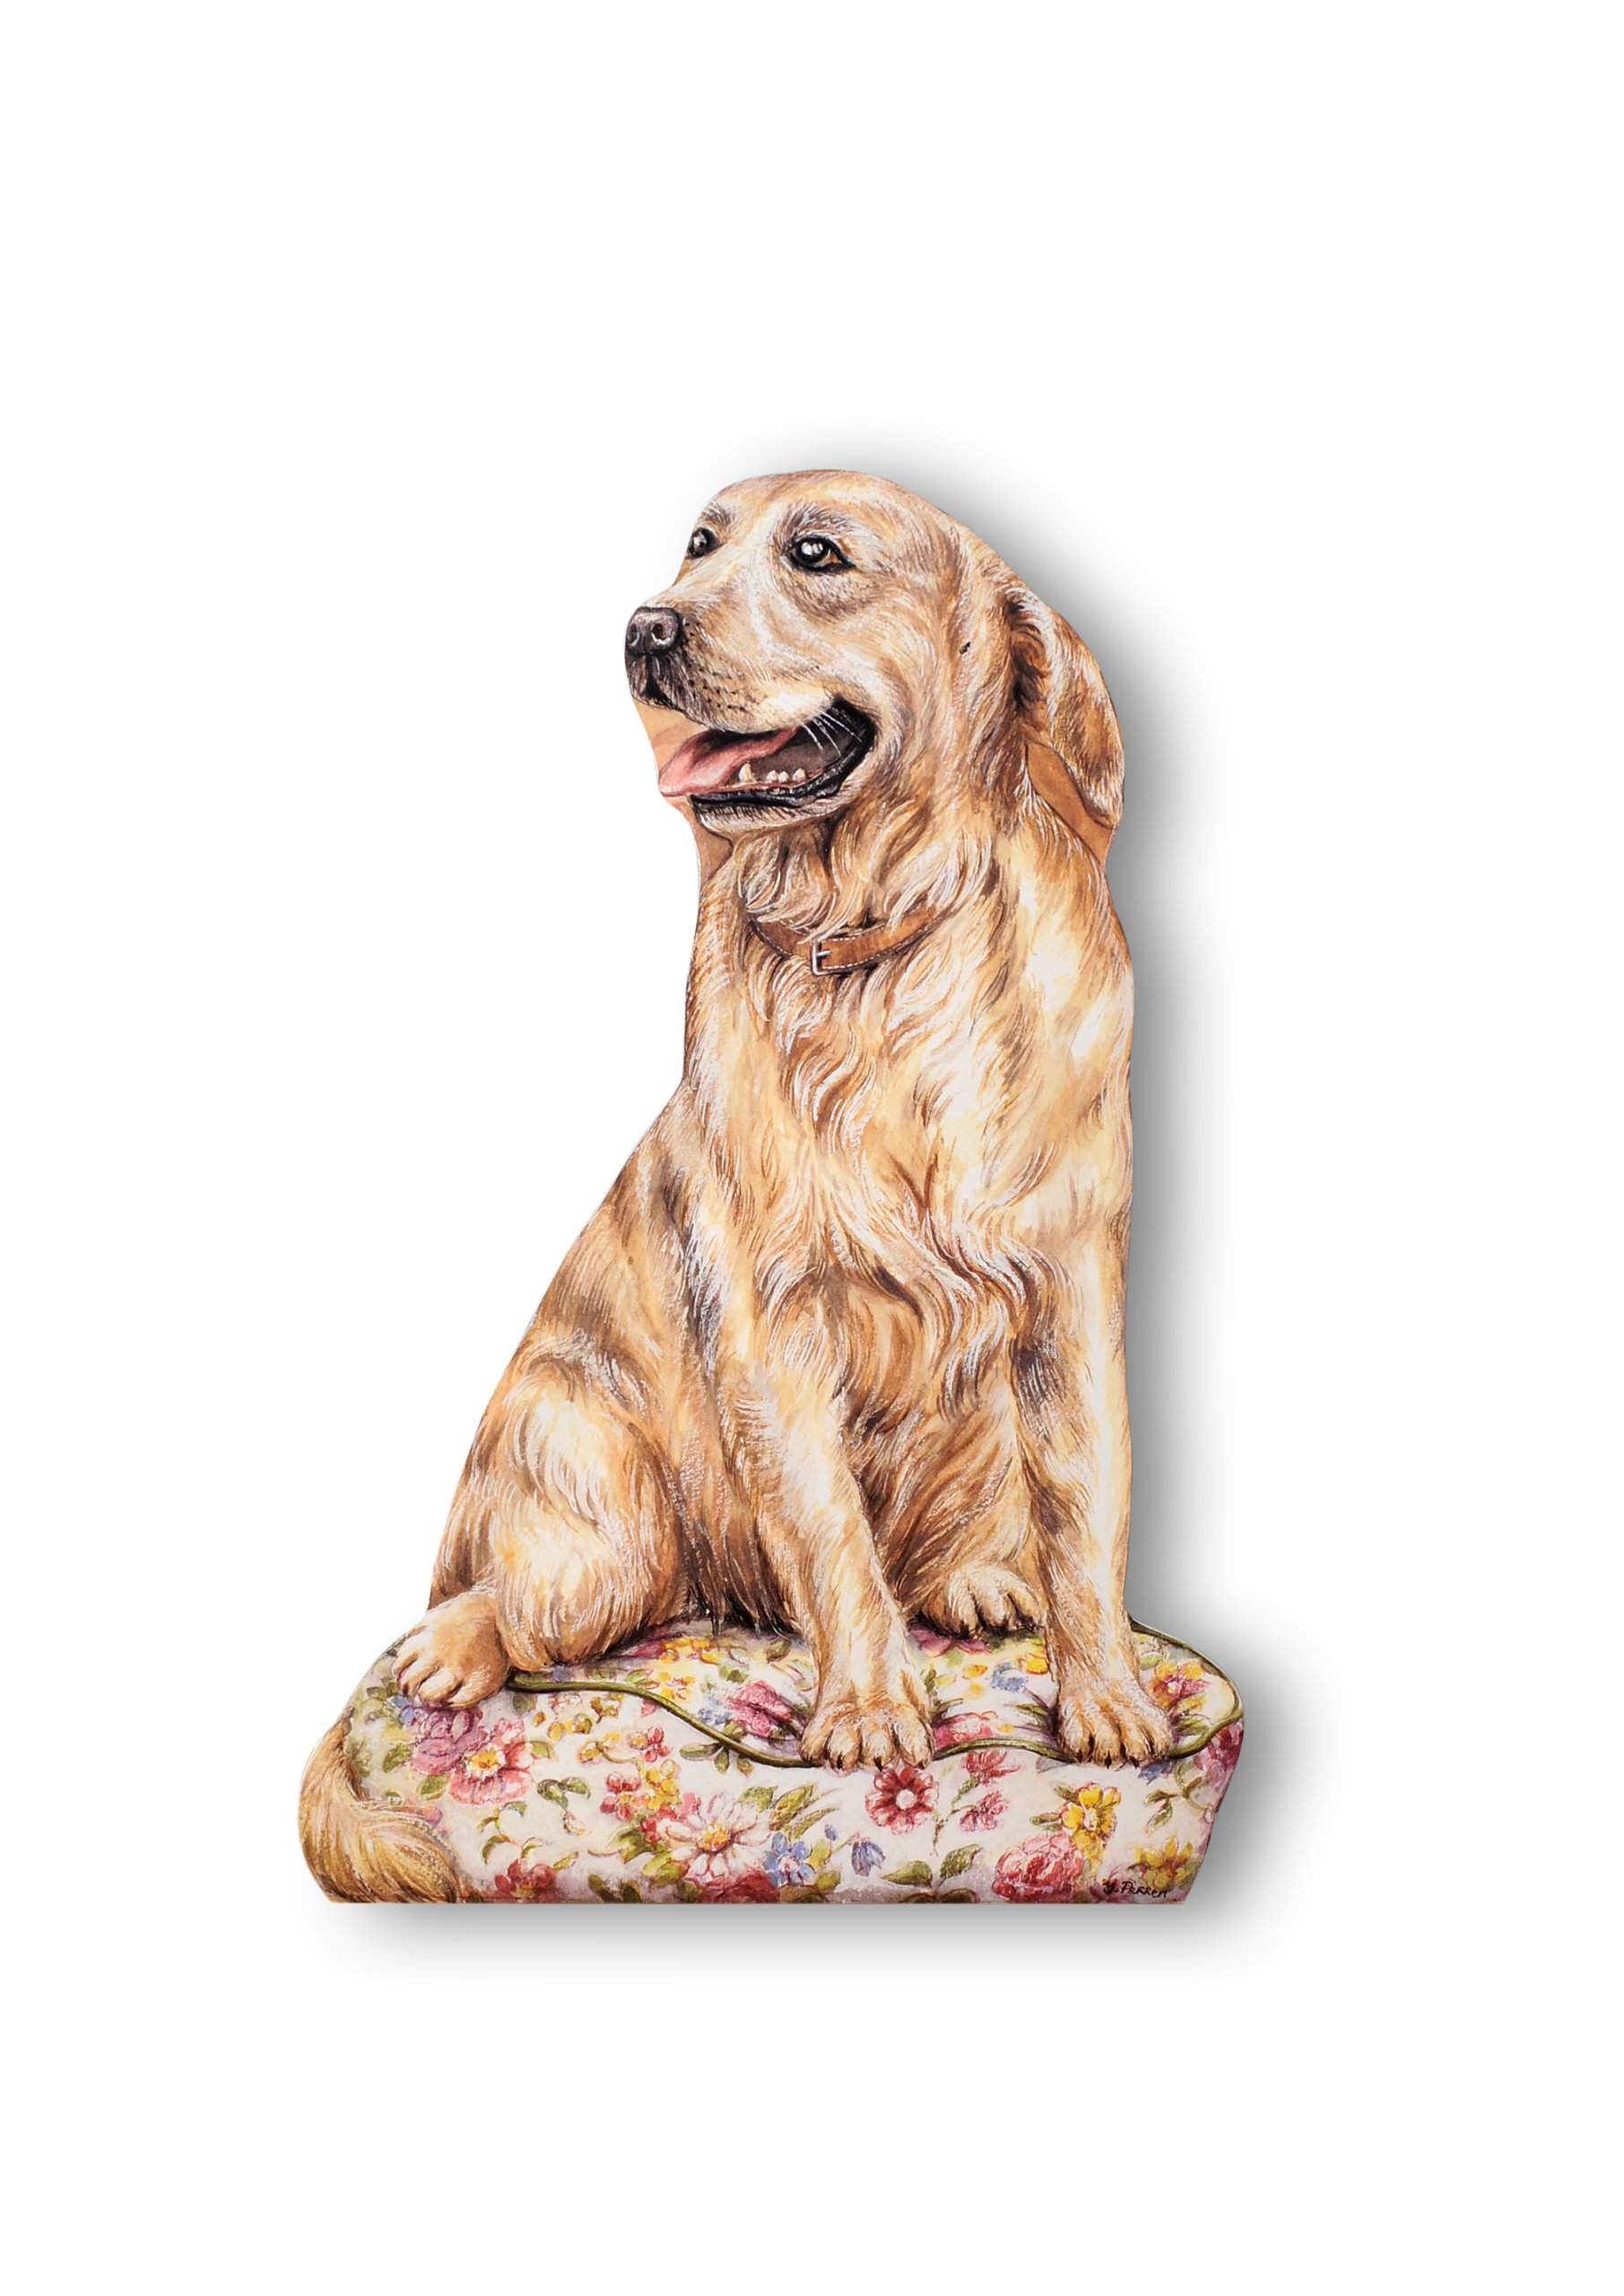 Stupell Home Décor Golden Retriever Decorative Dog Door Stop, 19 x 0.5 x 12.5, Proudly Made in USA